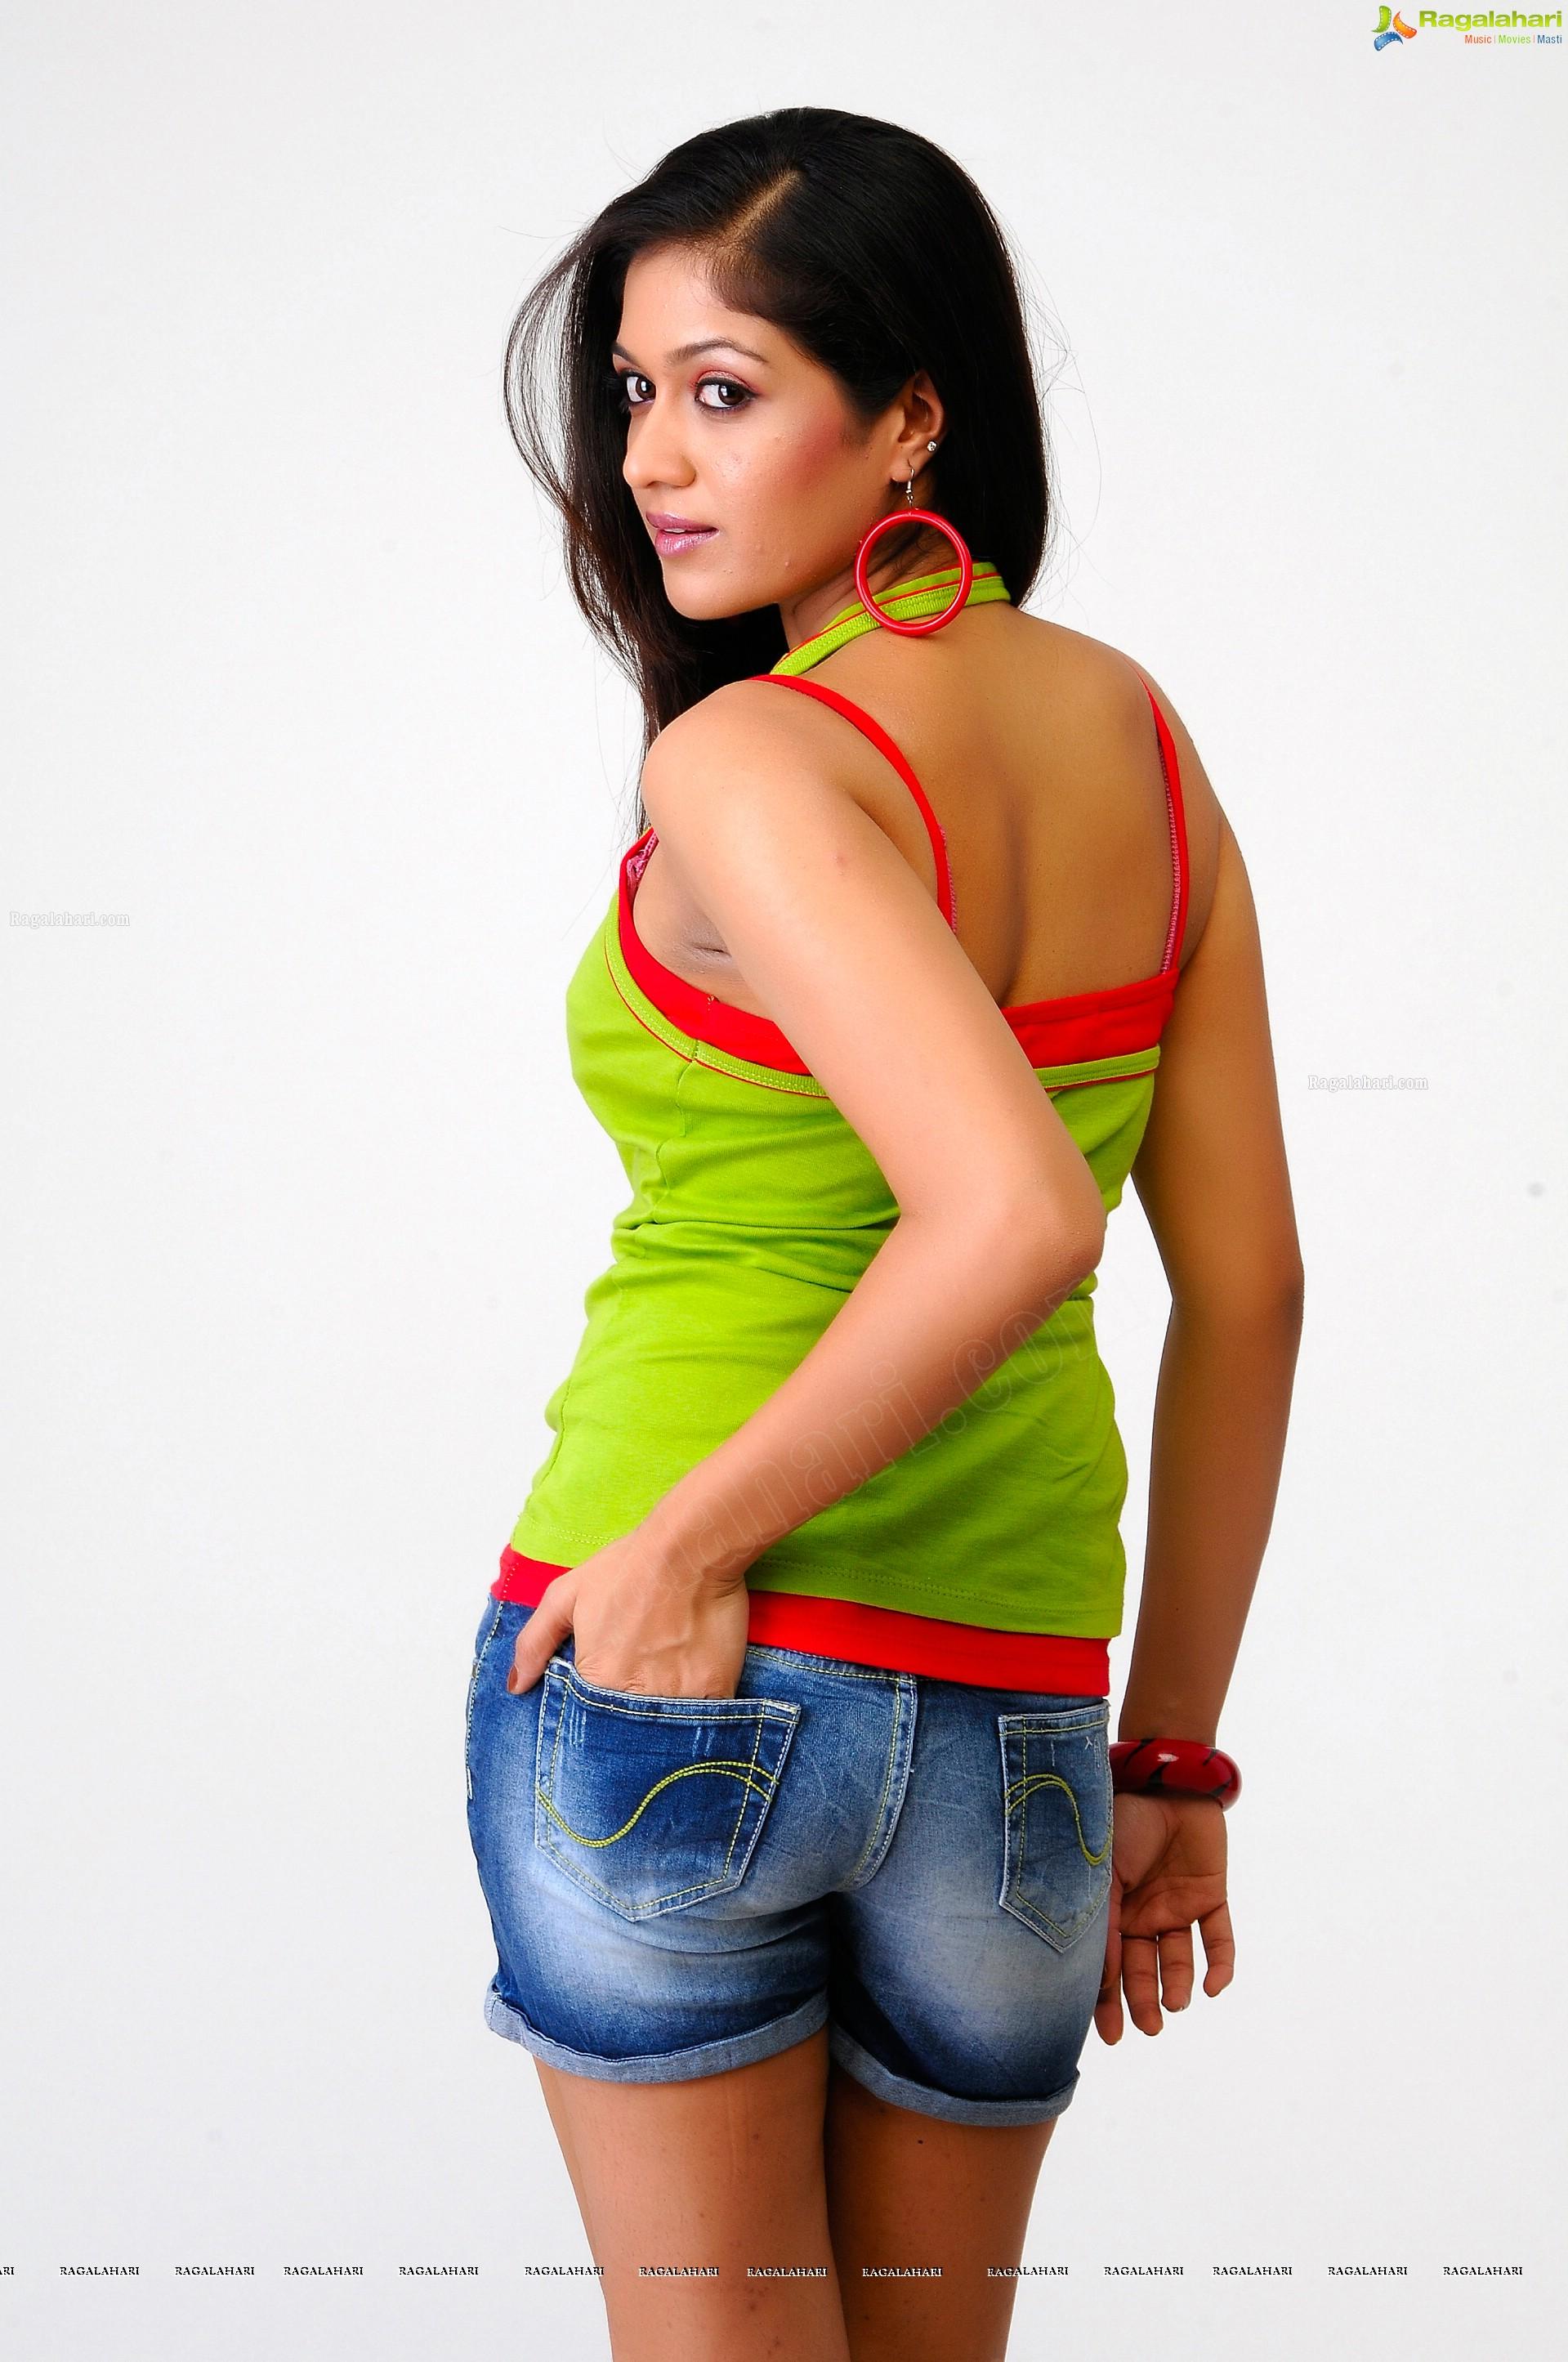 Meghana Raj Hd